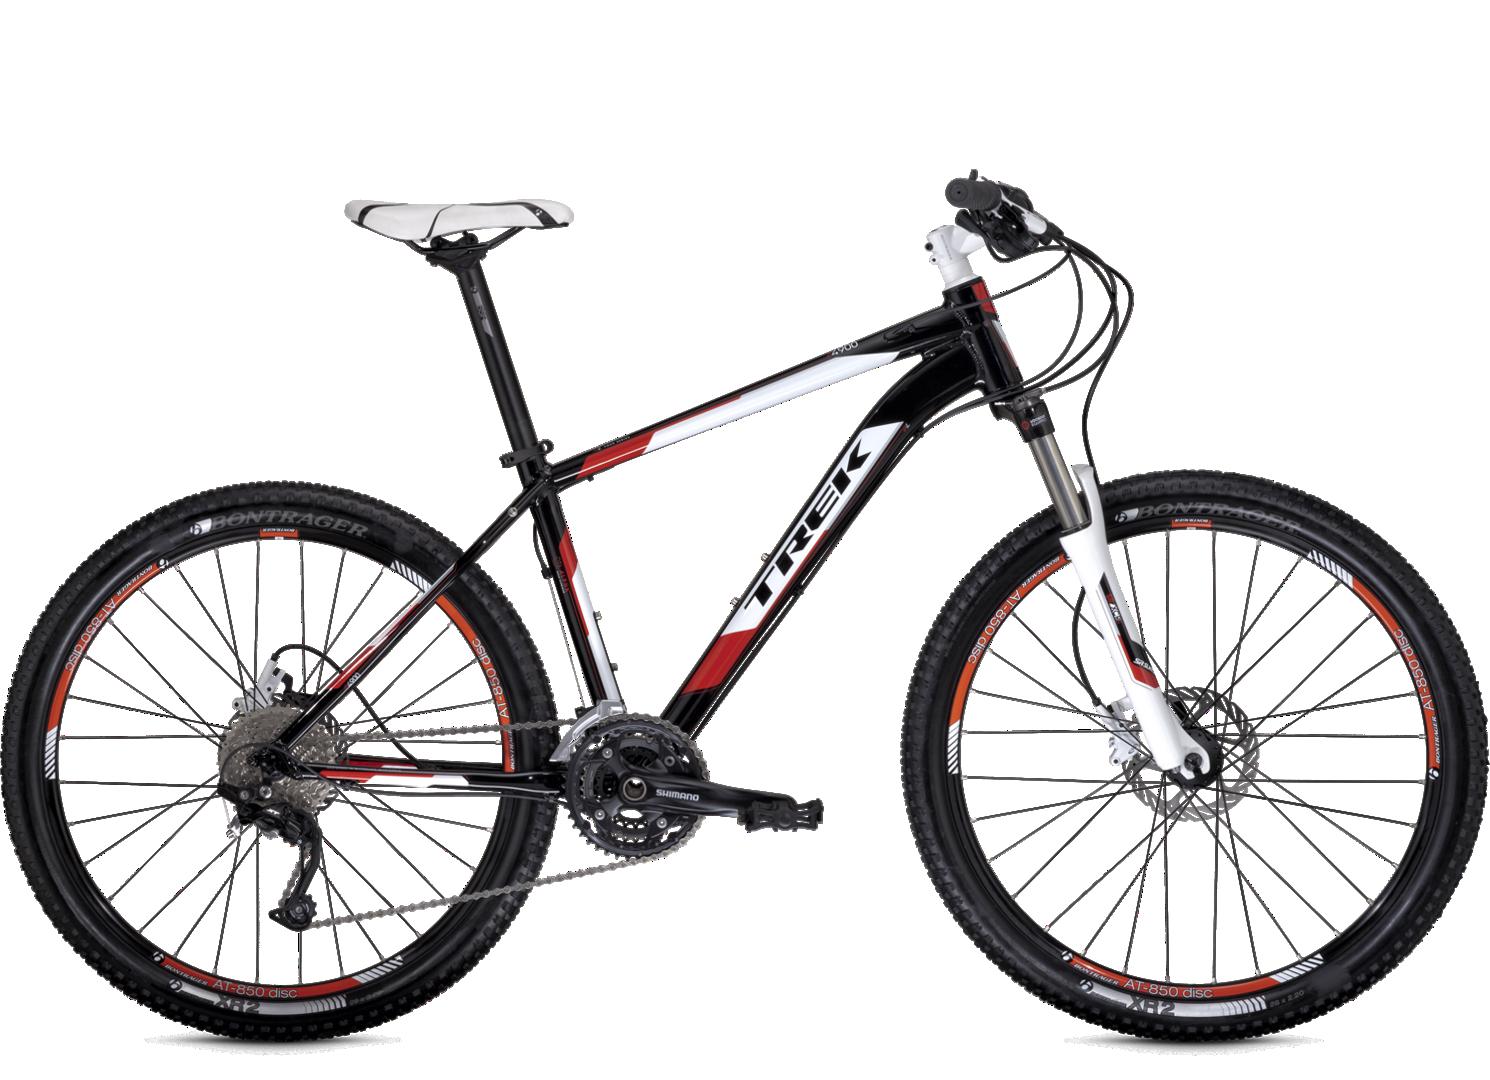 2013 4900 Disc Bike Archive Trek Bicycle